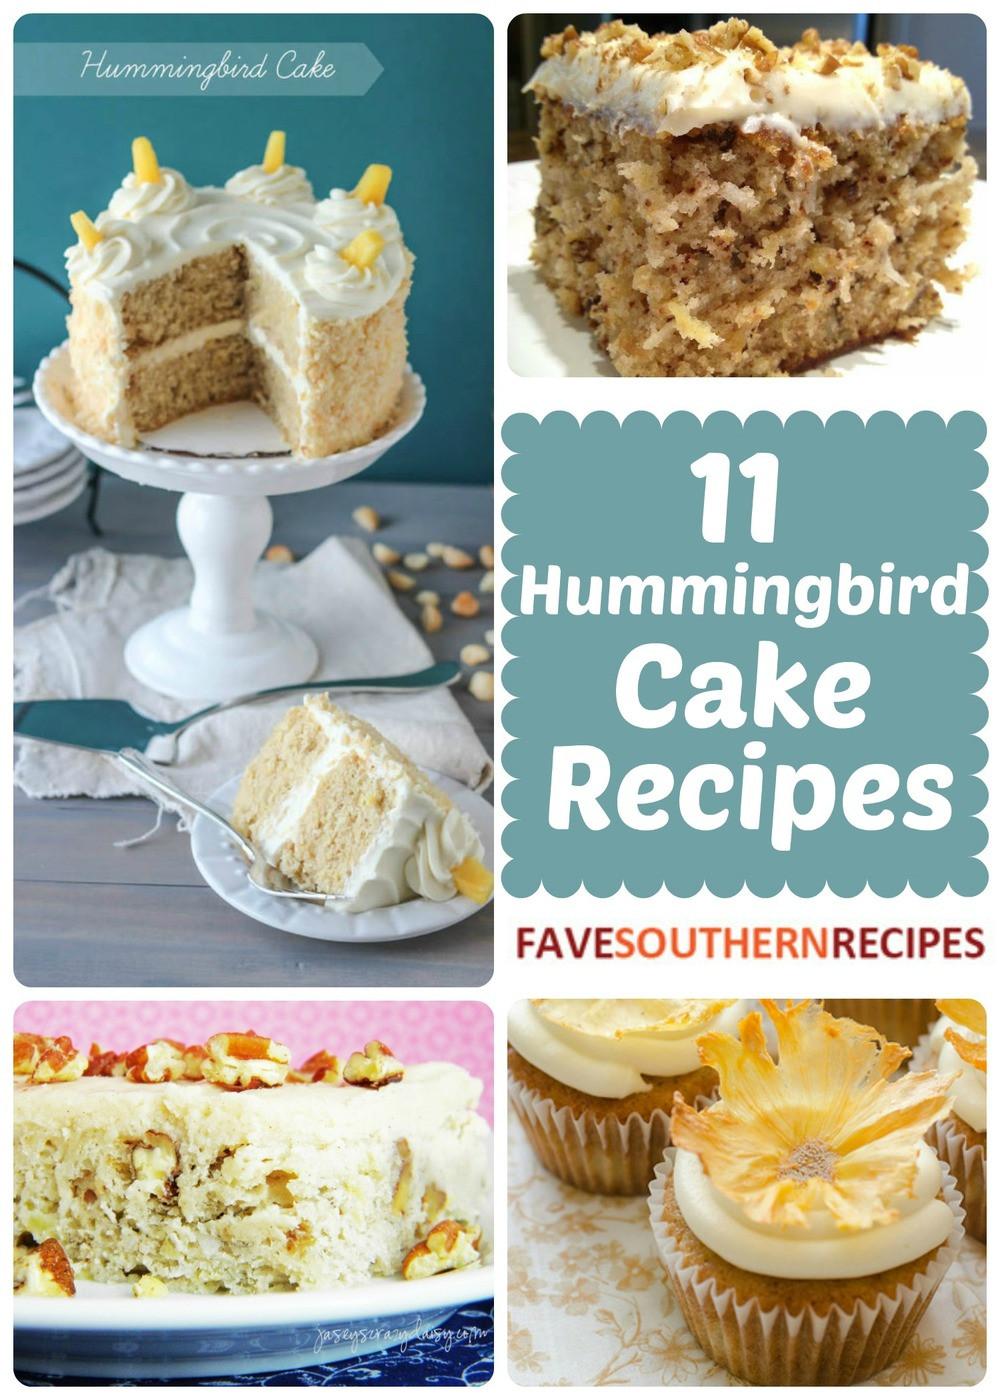 Southern Dessert Recipes  11 Hummingbird Cake Recipes The Best Southern Desserts